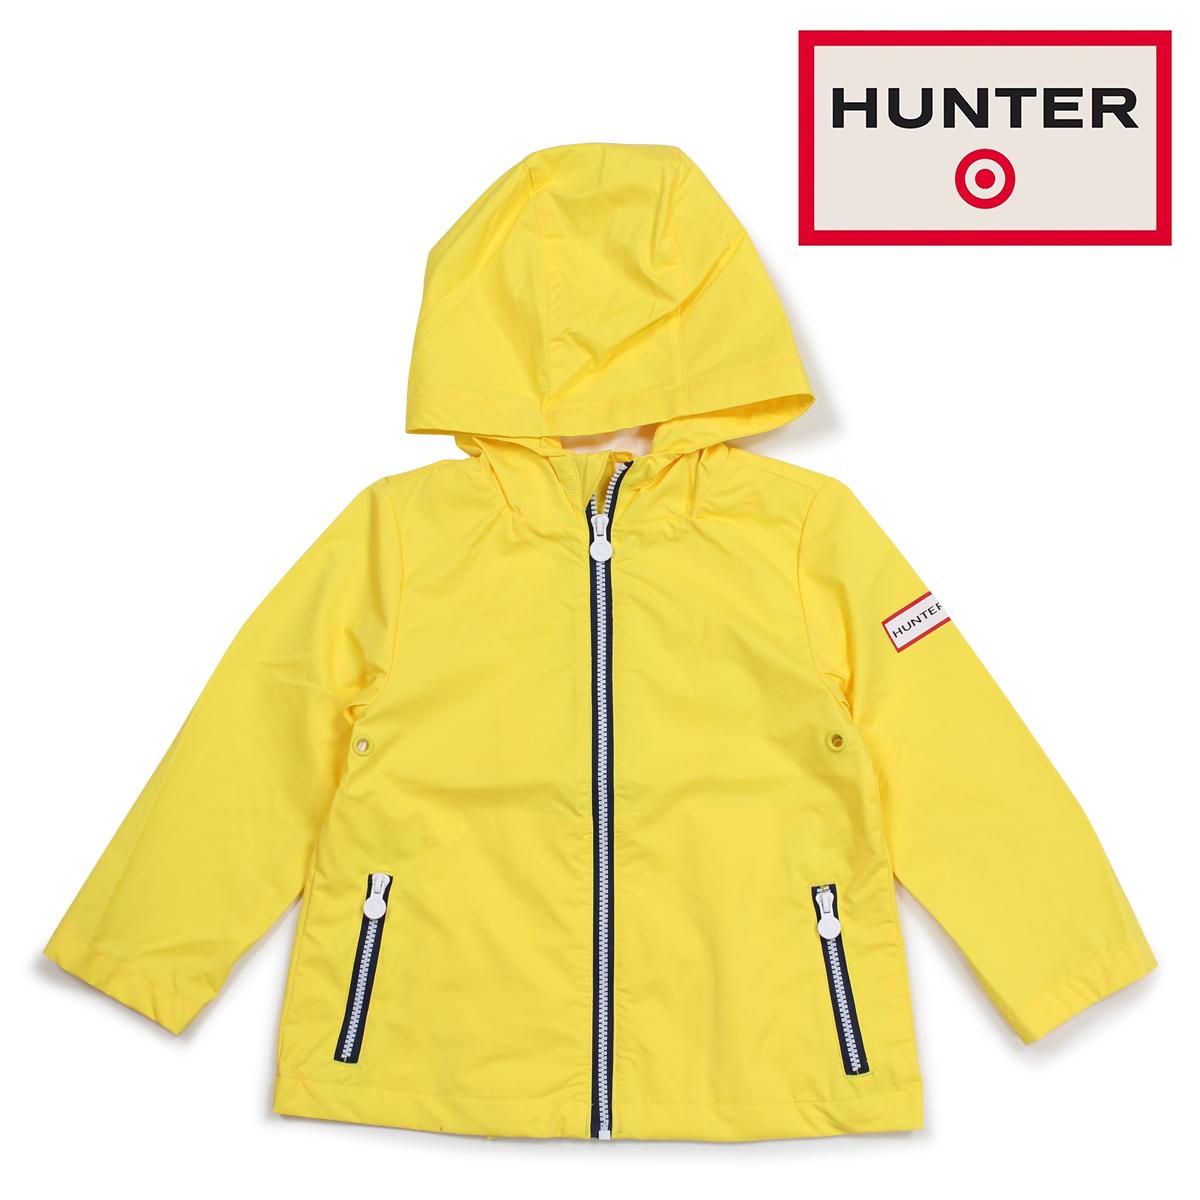 05419167b3a5 SneaK Online Shop  Hunter HUNTER raincoat kids rain jacket rain ...